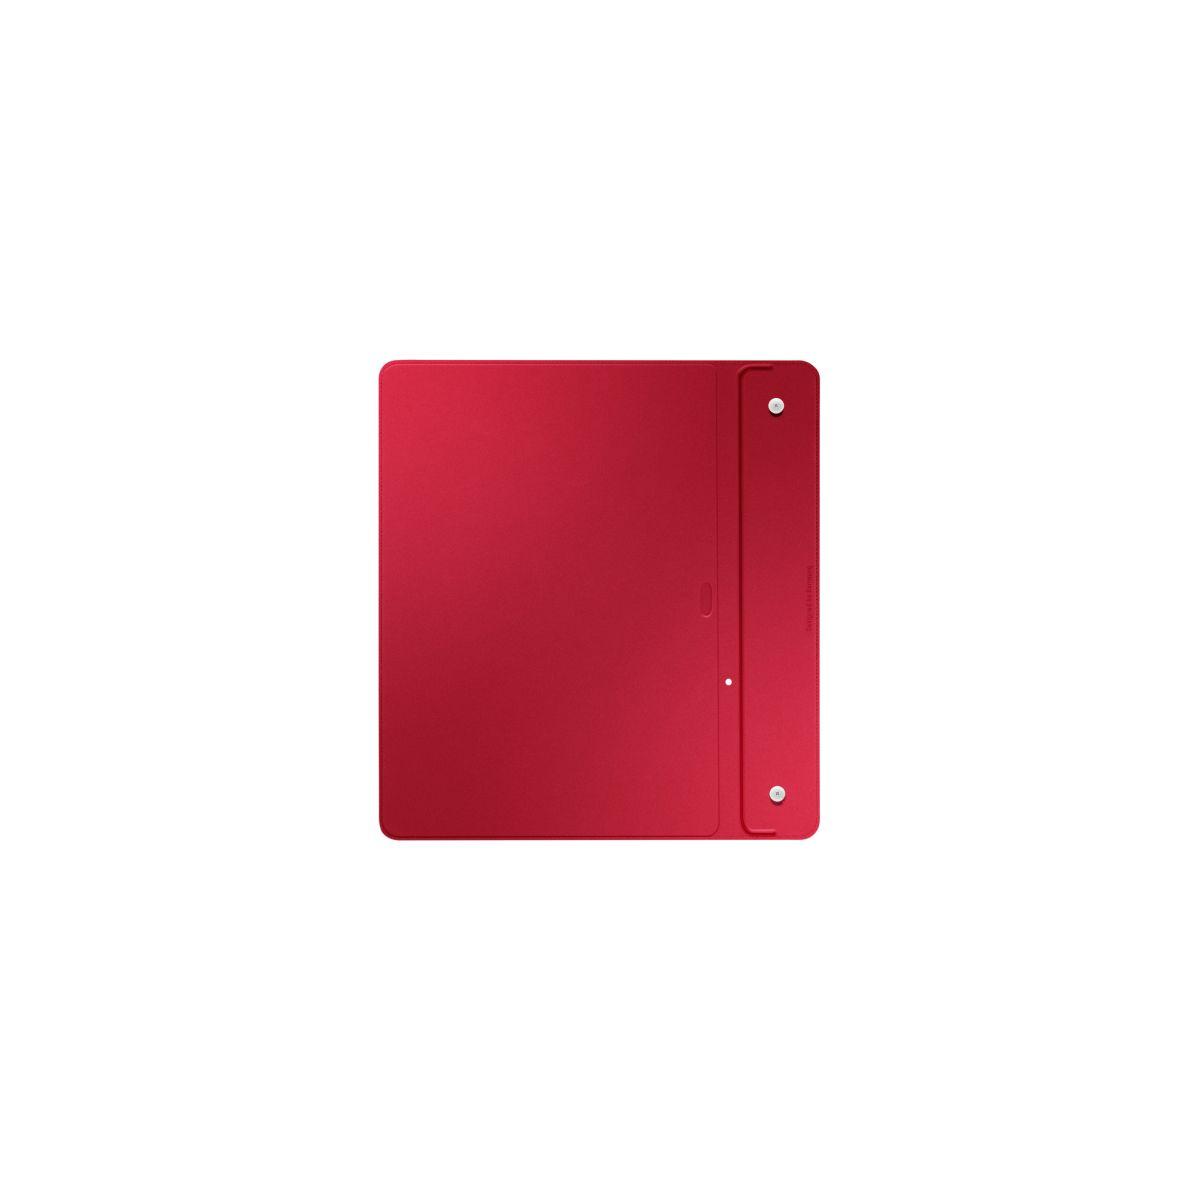 Cover samsung simple cover monaco tab s 10'' rouge - livraison offerte : code chronoff (photo)